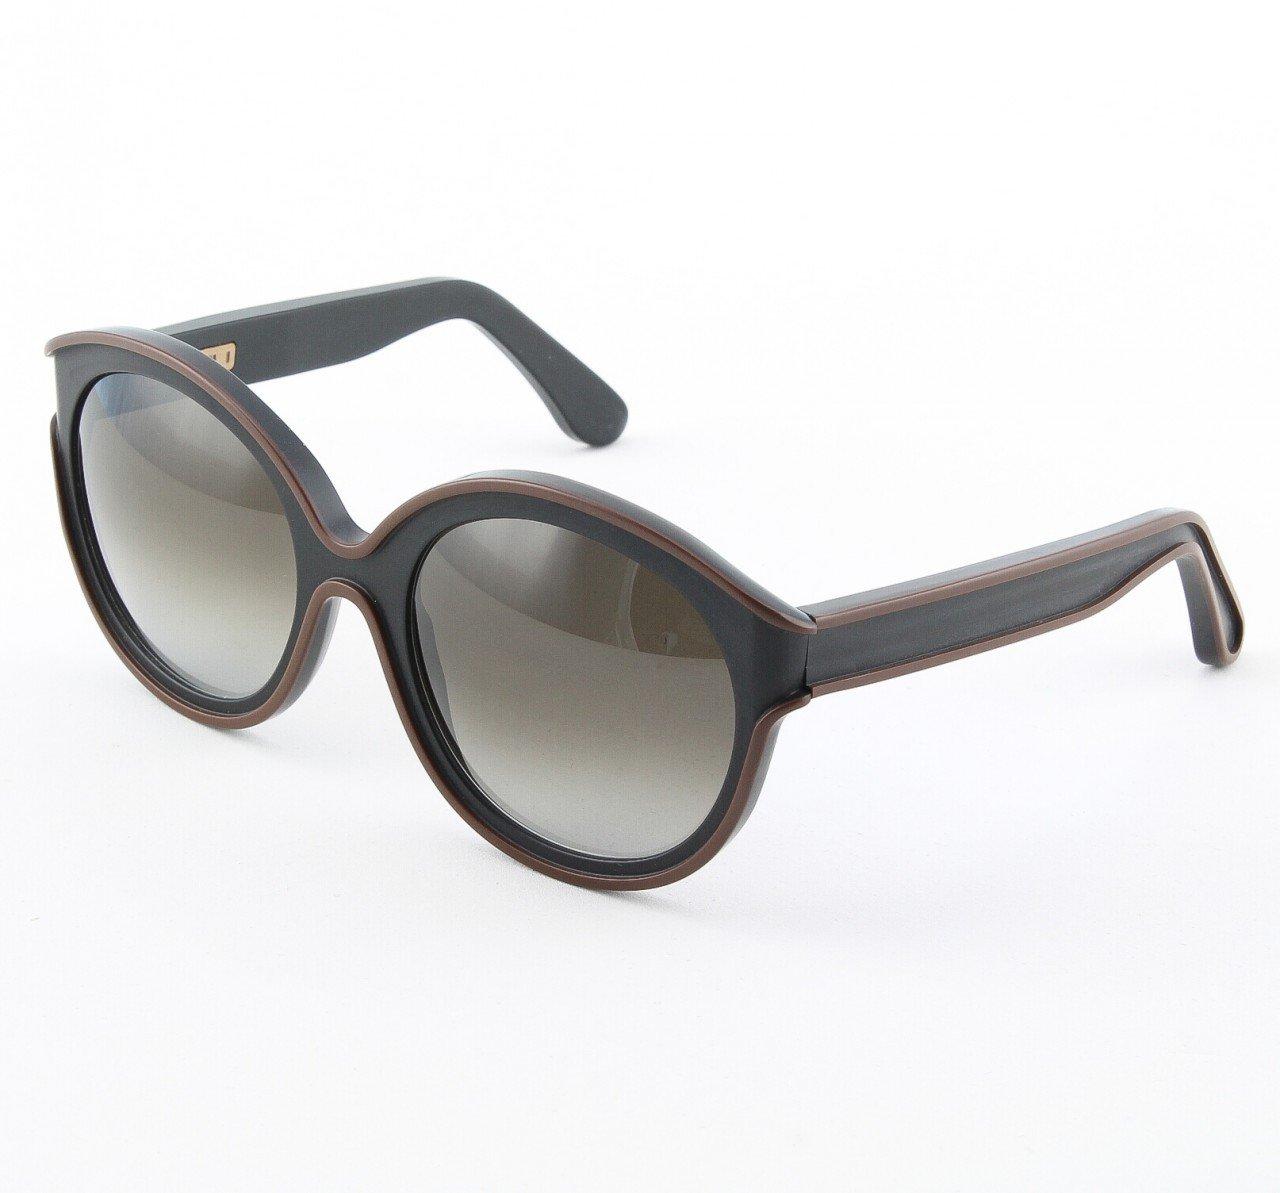 Marni MA195 Sunglasses Col. 05 Opaque Black w/ Chocolate Brown Trim with Gray Gradient Lenses